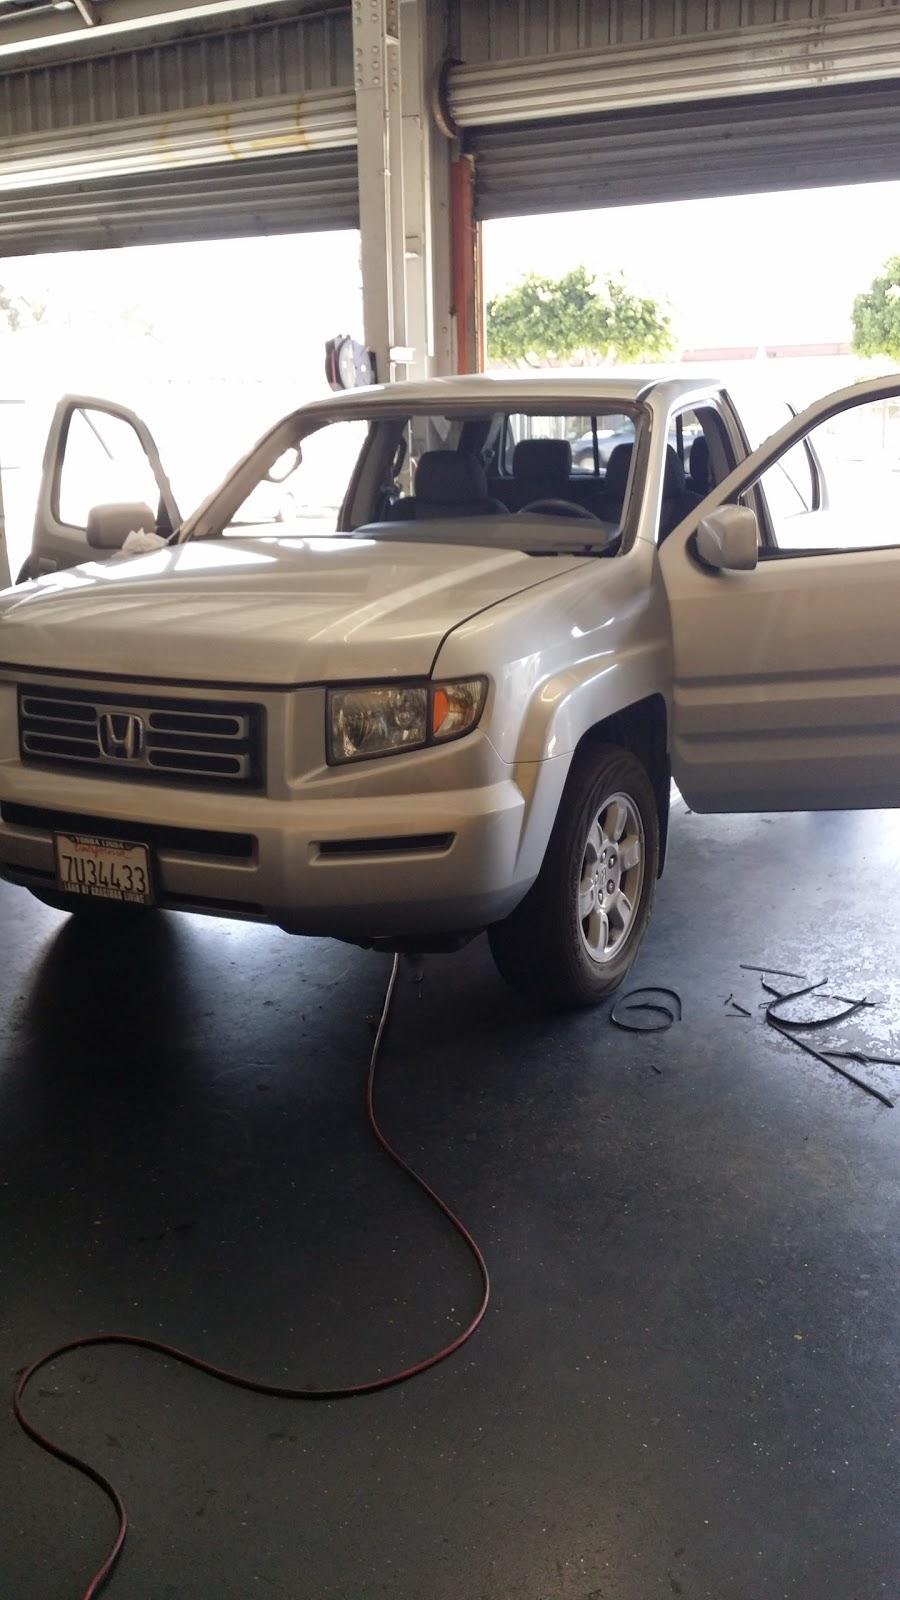 GTO Auto Glass - car repair  | Photo 7 of 10 | Address: 1001 N Mission Rd, Los Angeles, CA 90033, USA | Phone: (800) 655-9623